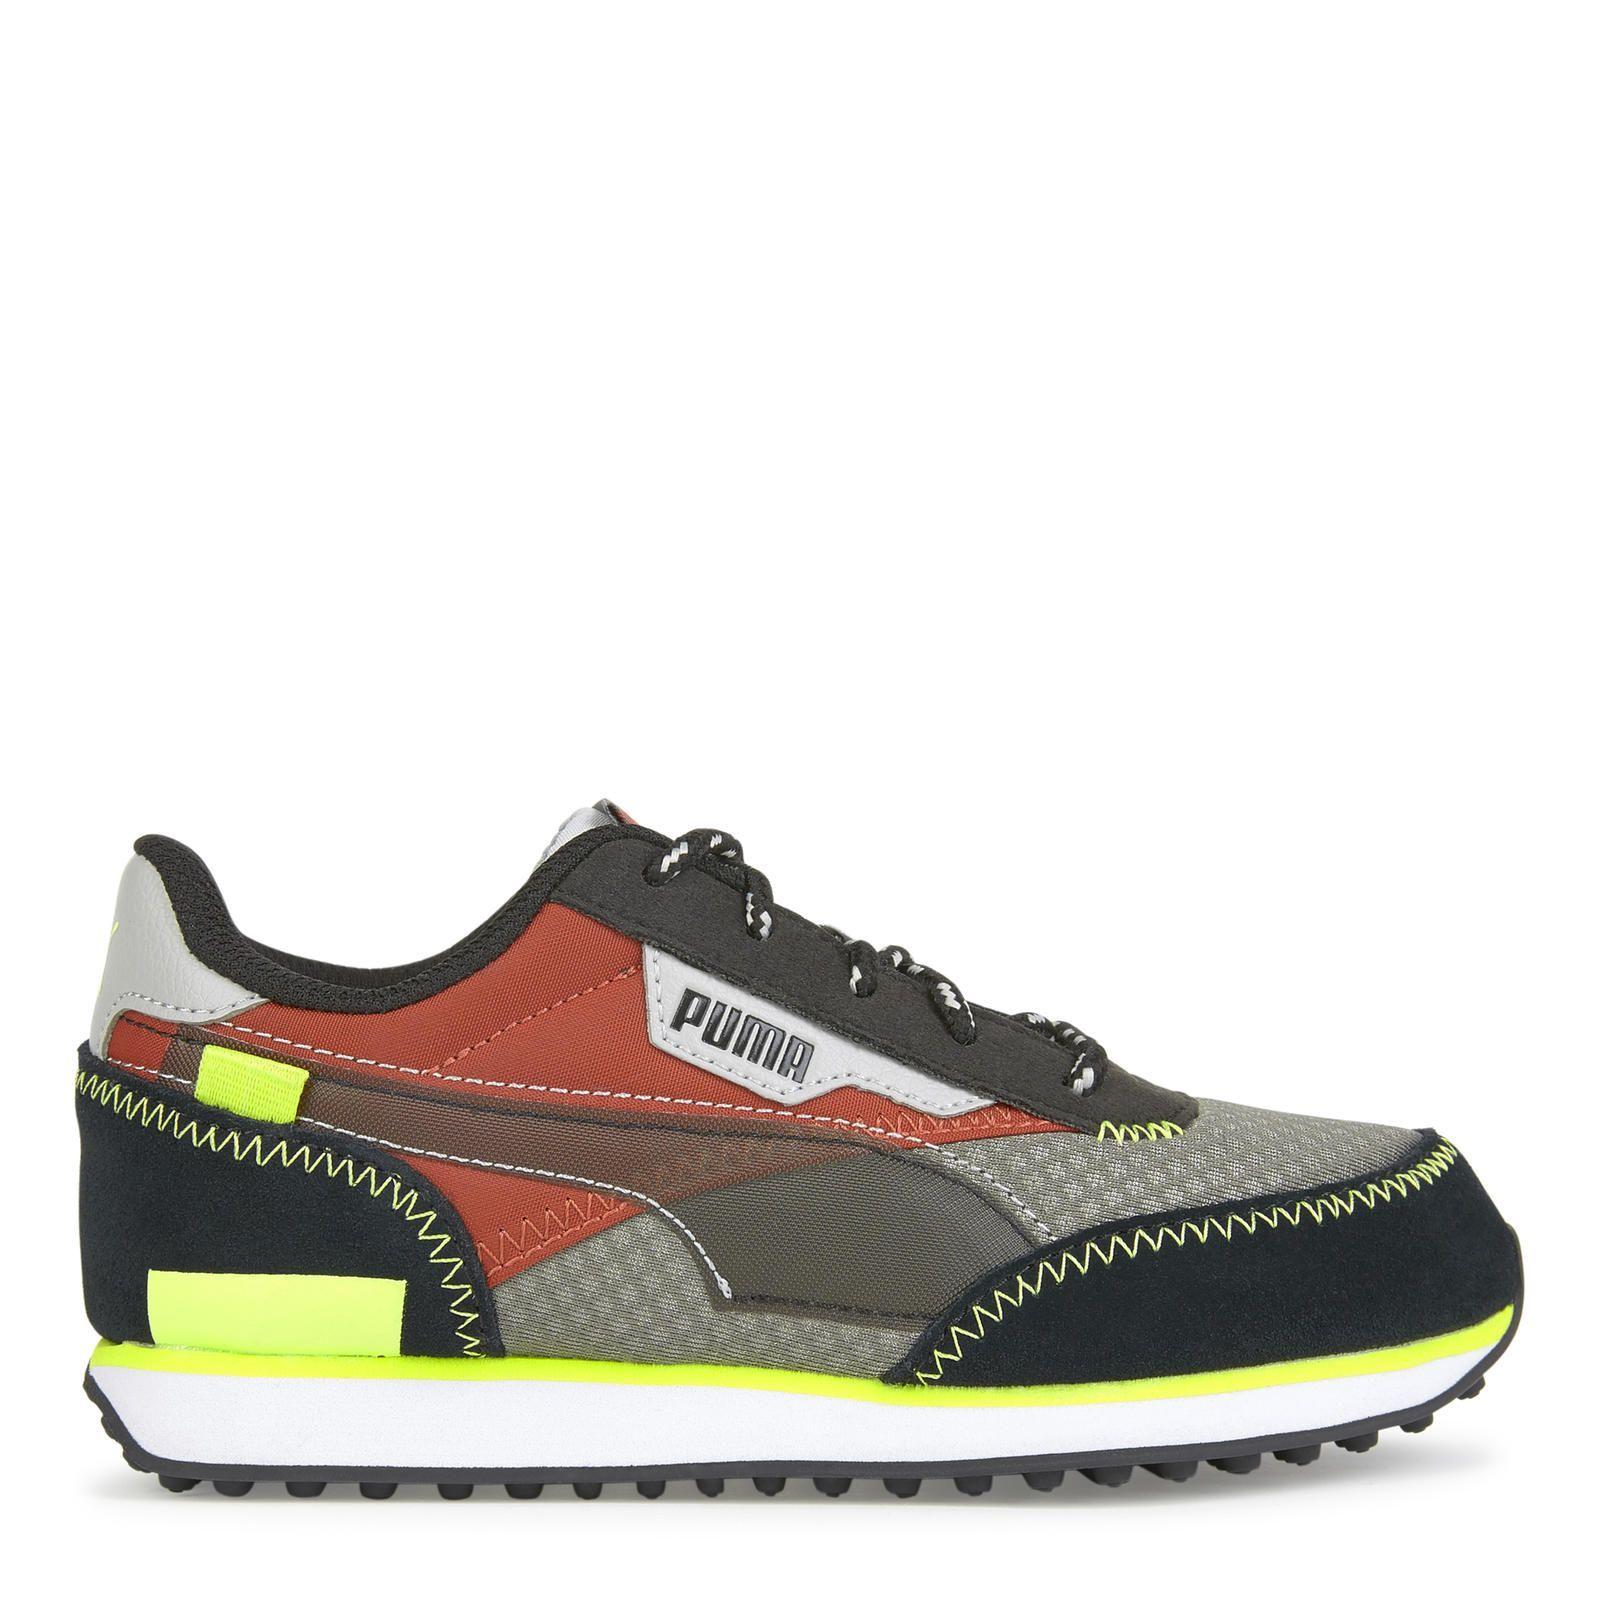 Puma Grey Upper 50 Textile 50 Polyurethane Lining 100 Textile Midsoles 100 Eva Outsoles 100 Rubber Bi Material Trainers Fut Puma Pumas Shoes Trainers